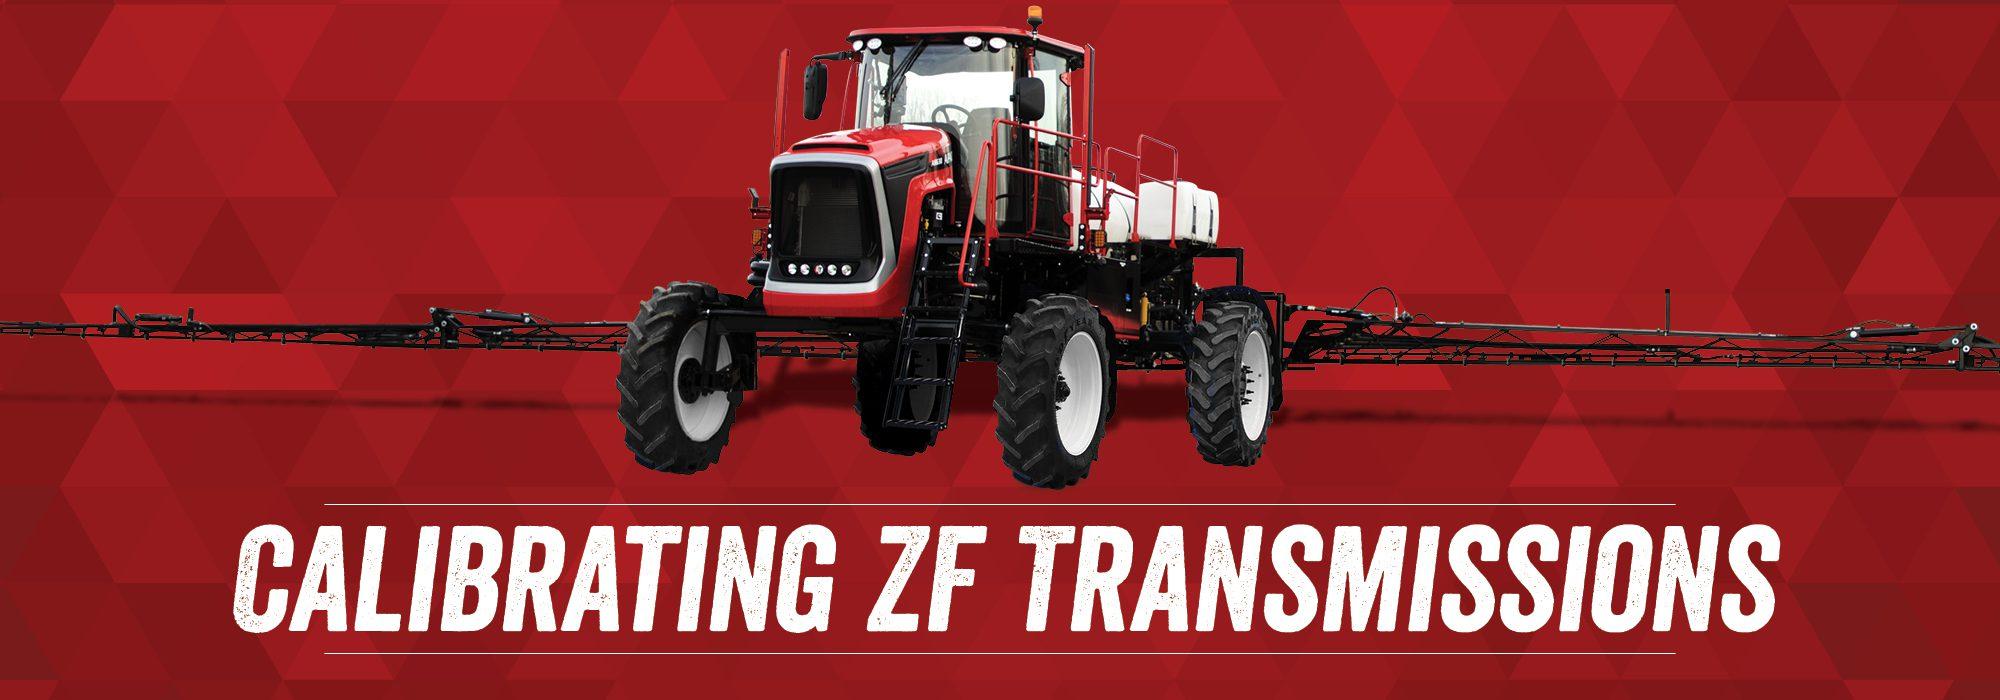 Calibrating ZF Transmissions